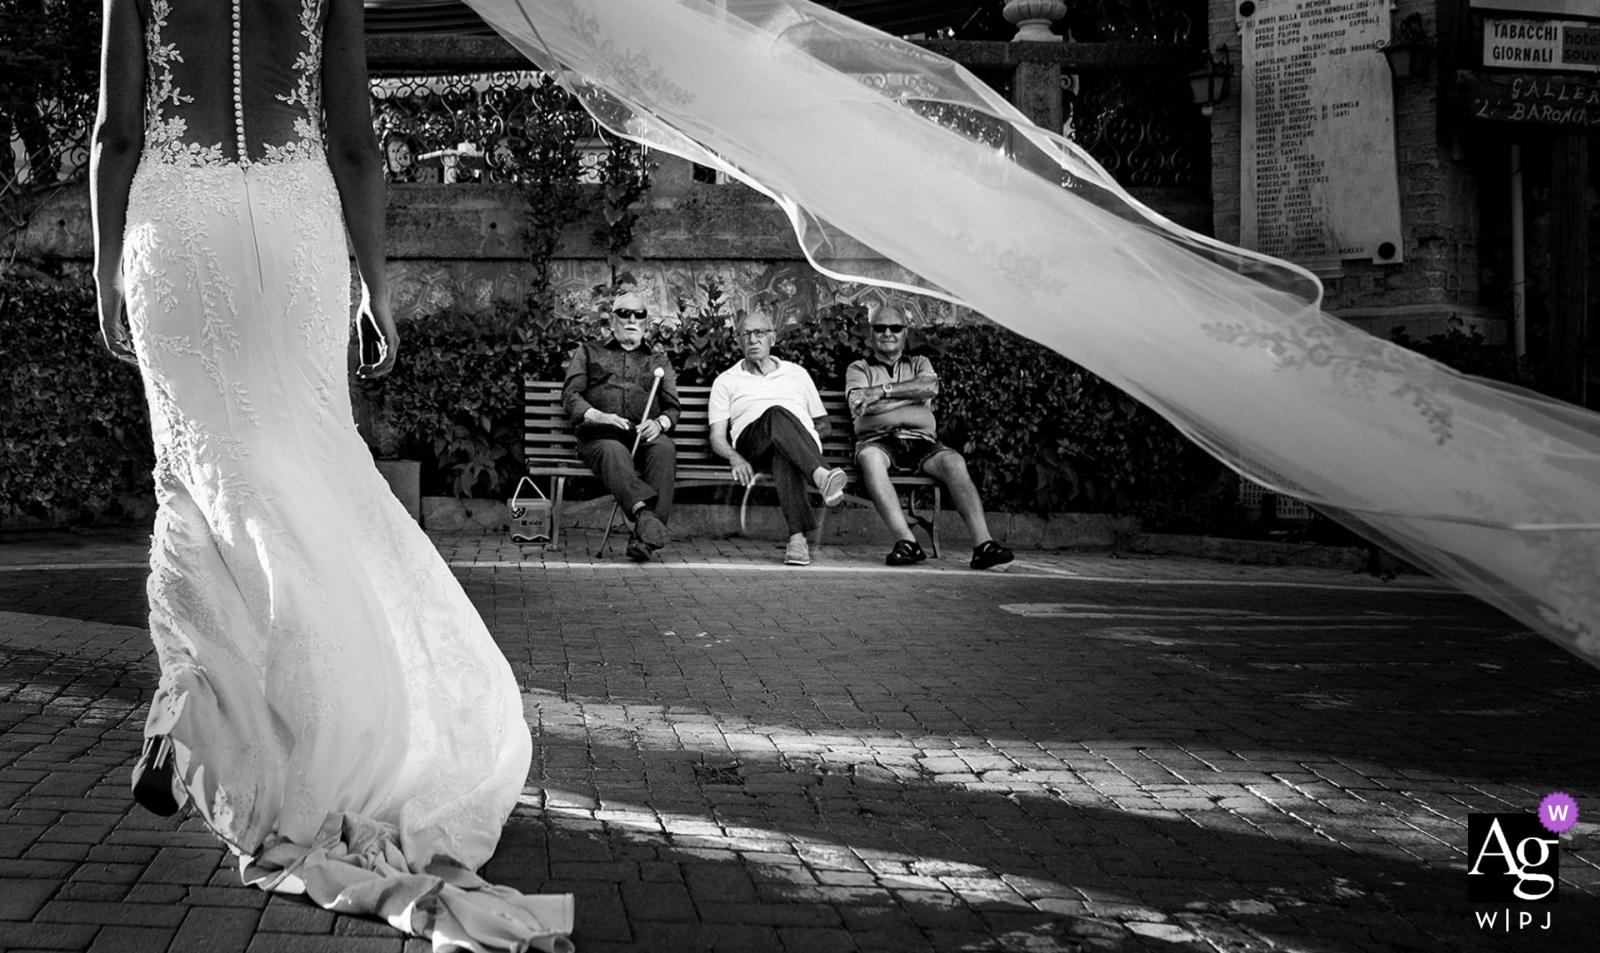 Pasquale Minniti is an artistic wedding photographer for Reggio Calabria